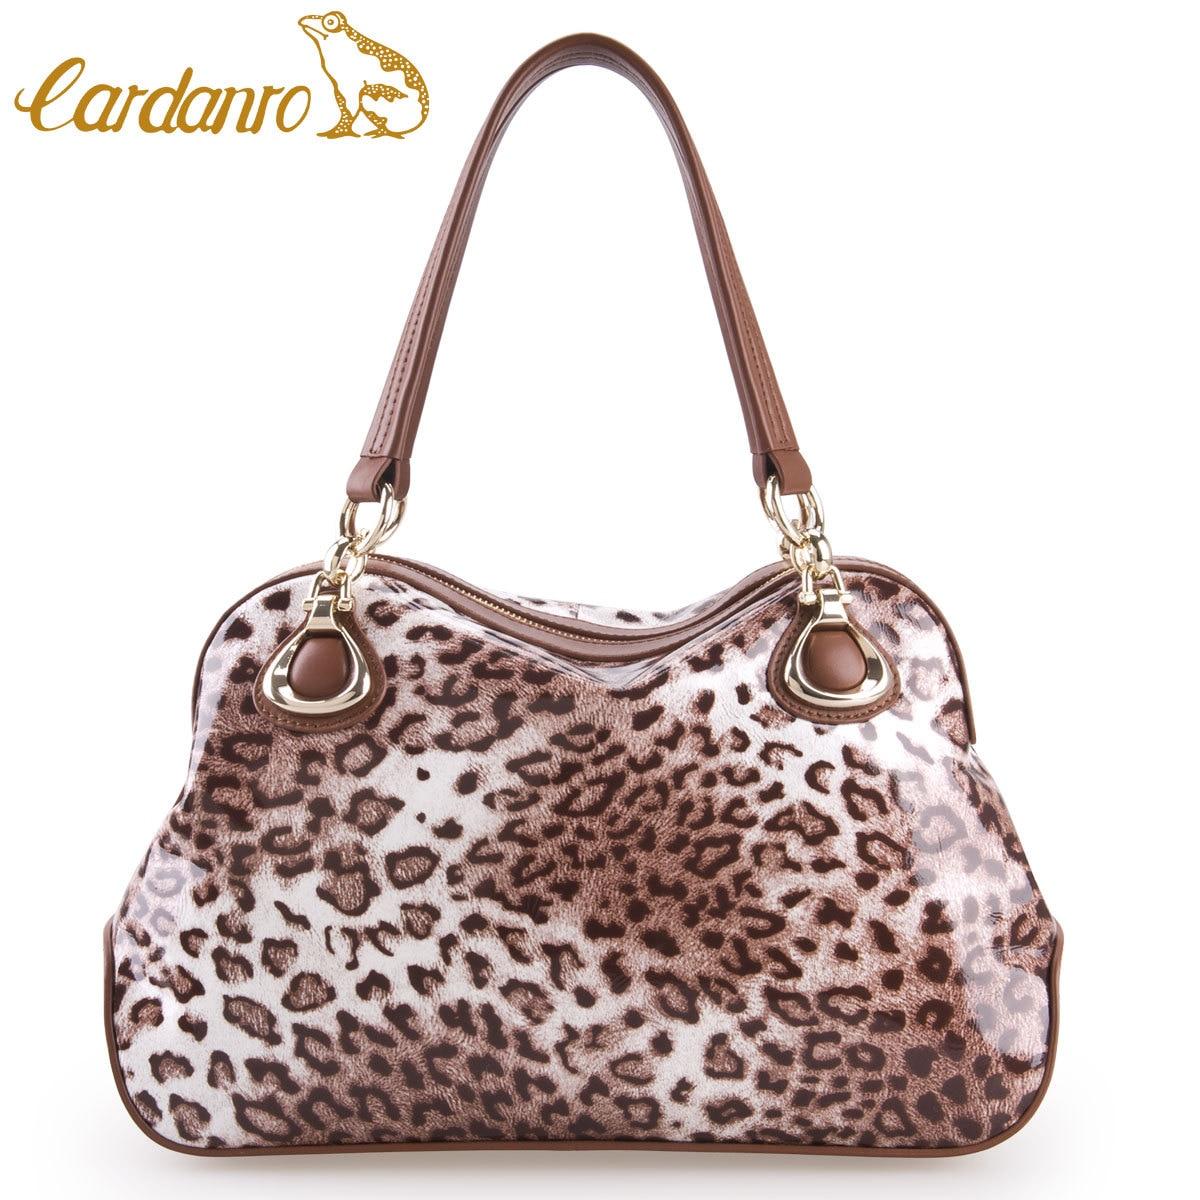 CARDANRO women s handbag genuine leather first layer of cowhide leopard  print fashion women s fashion handbag shoulder bag on Aliexpress.com  8d96d8e90647f